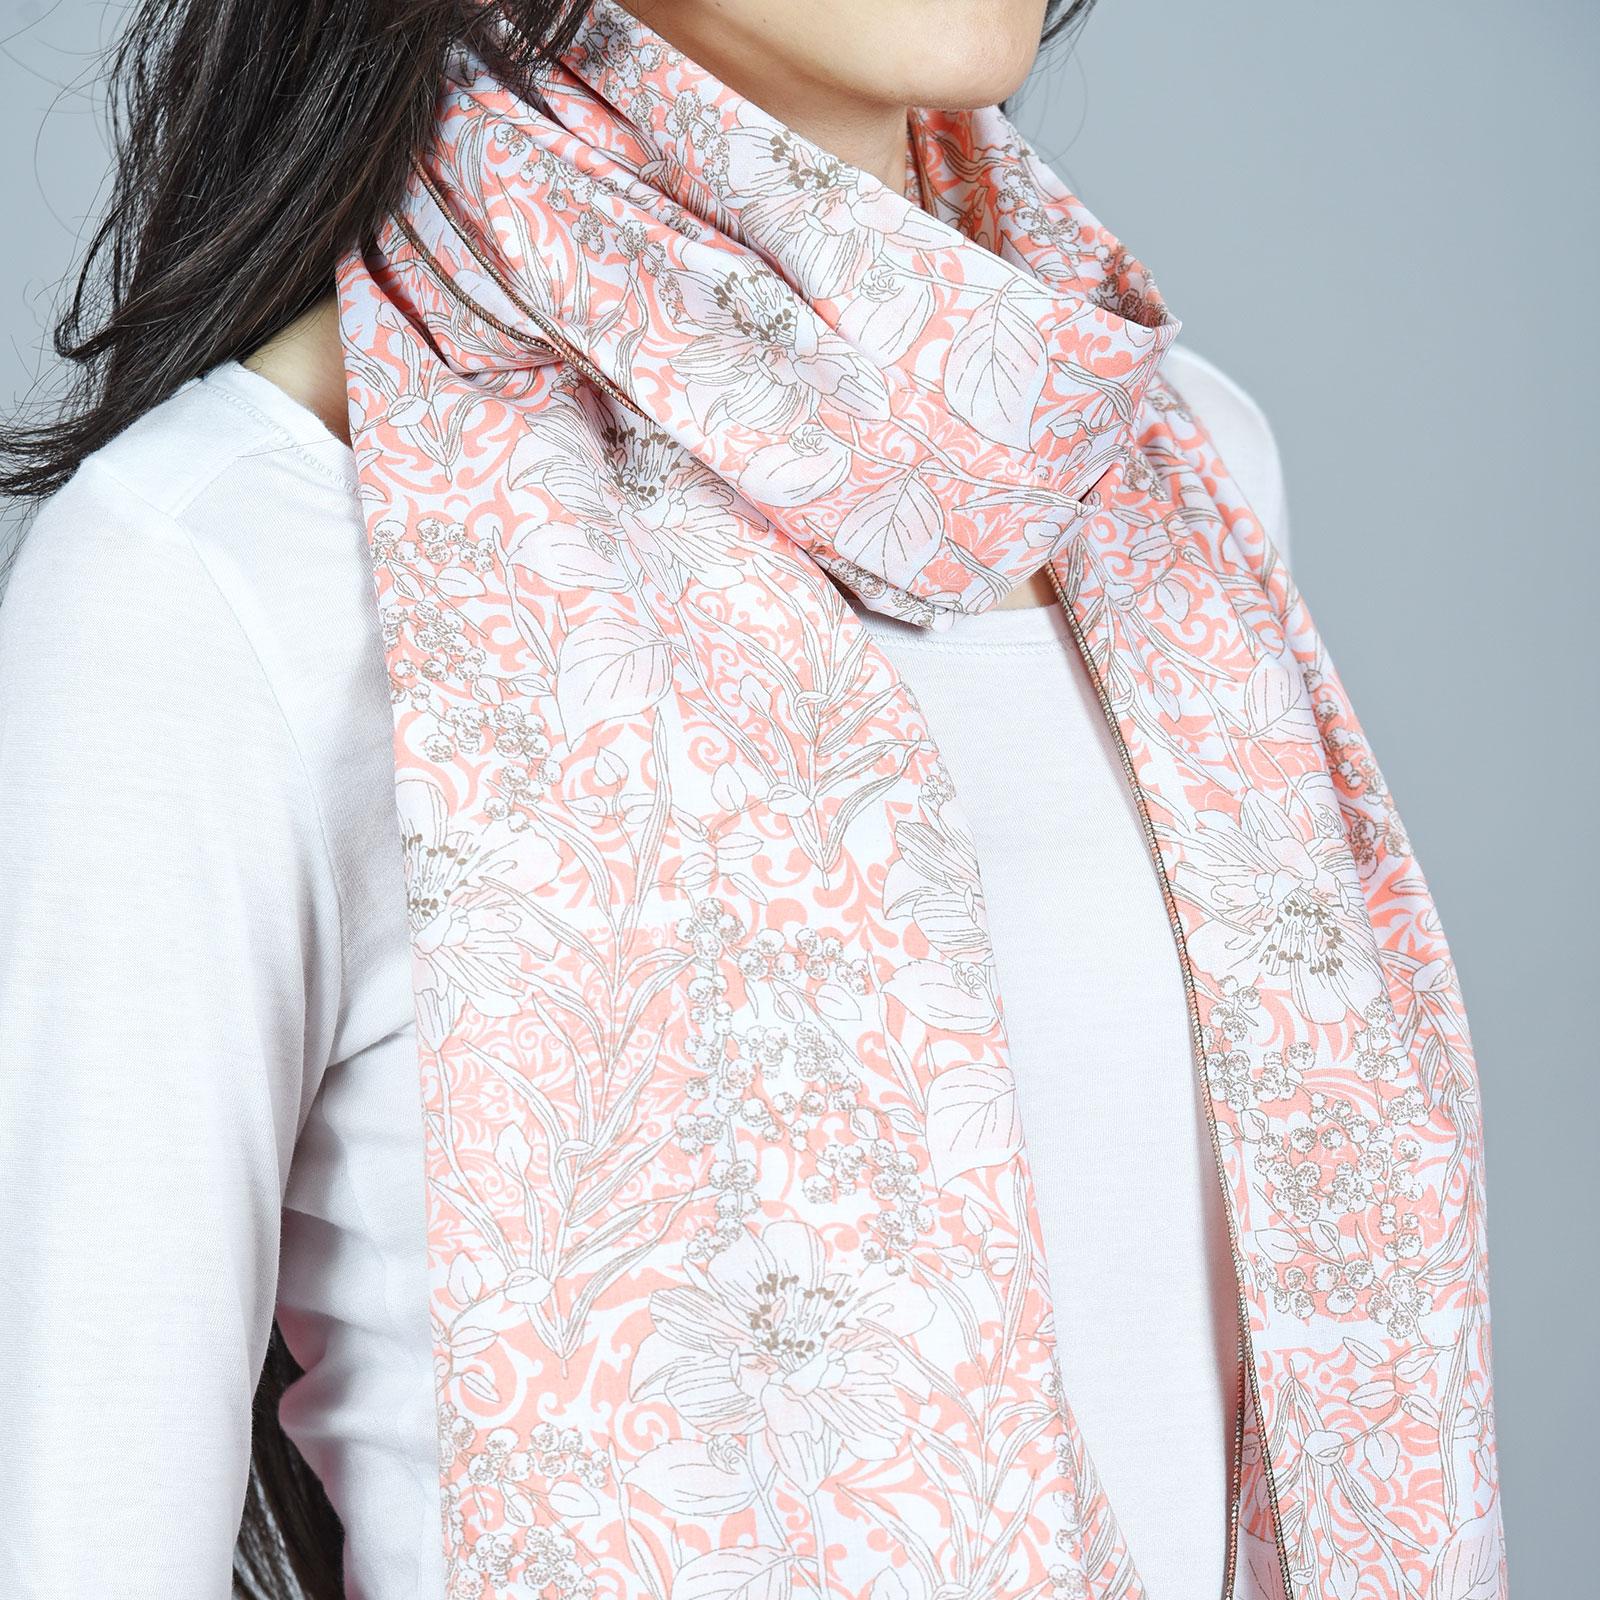 AT-04487-VF16-2-echarpe-femme-rose-corail